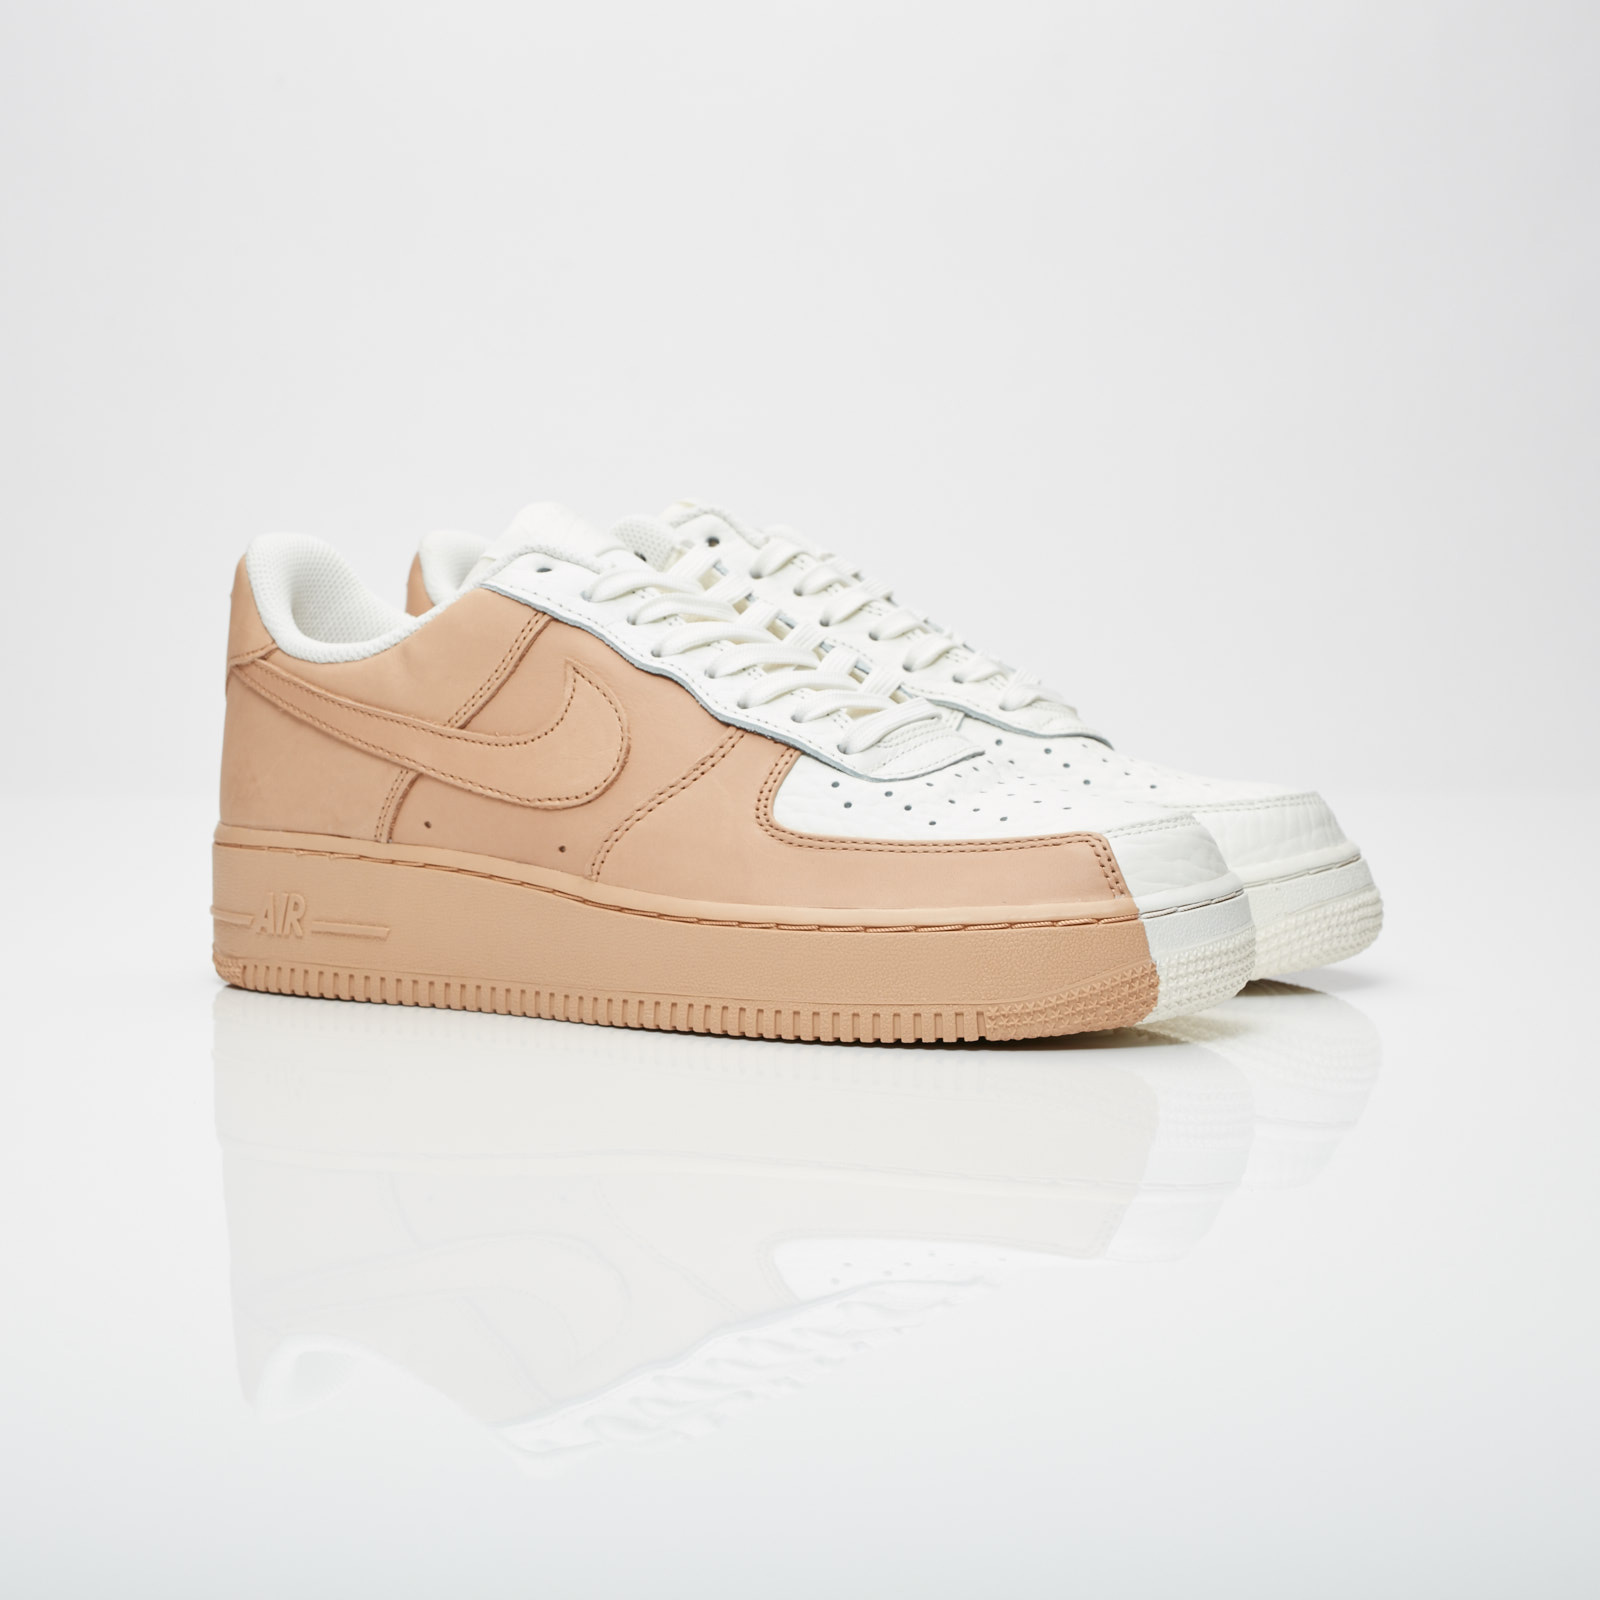 hot sale online 18631 104ff Nike Sportswear Air Force 1 07 Premium